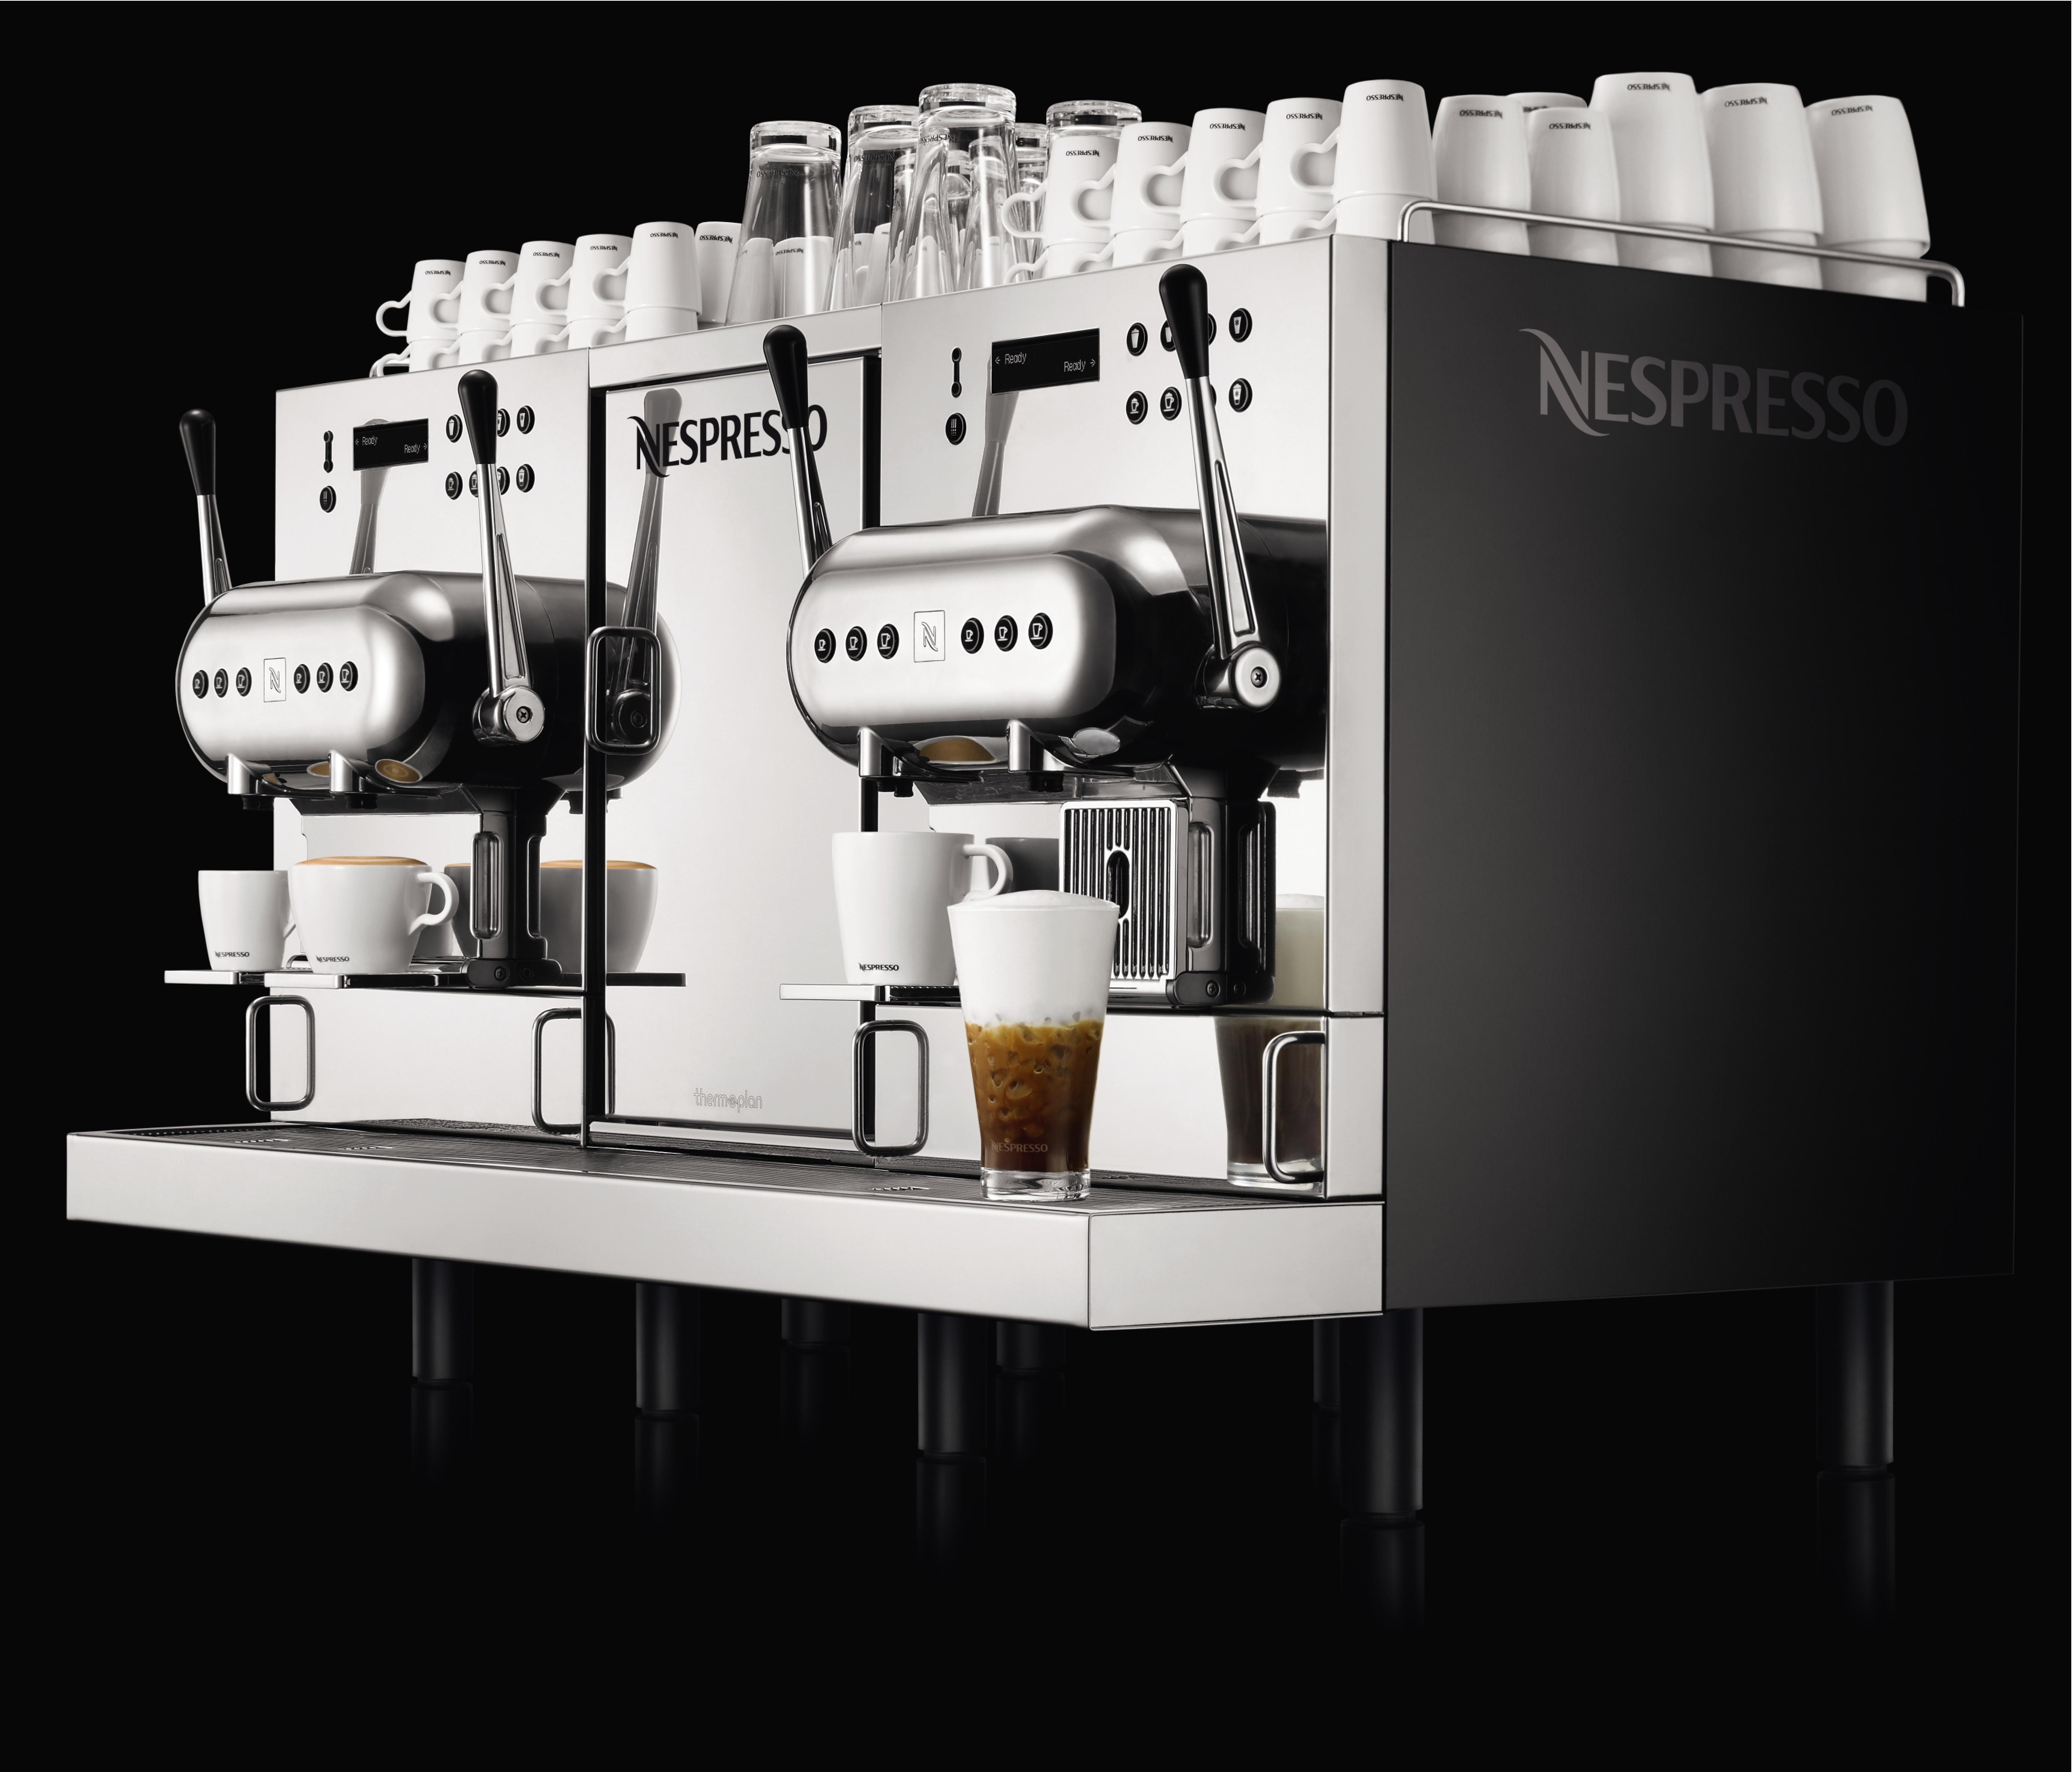 Nespresso erhverv husholdningsapparater for Nespresso firma